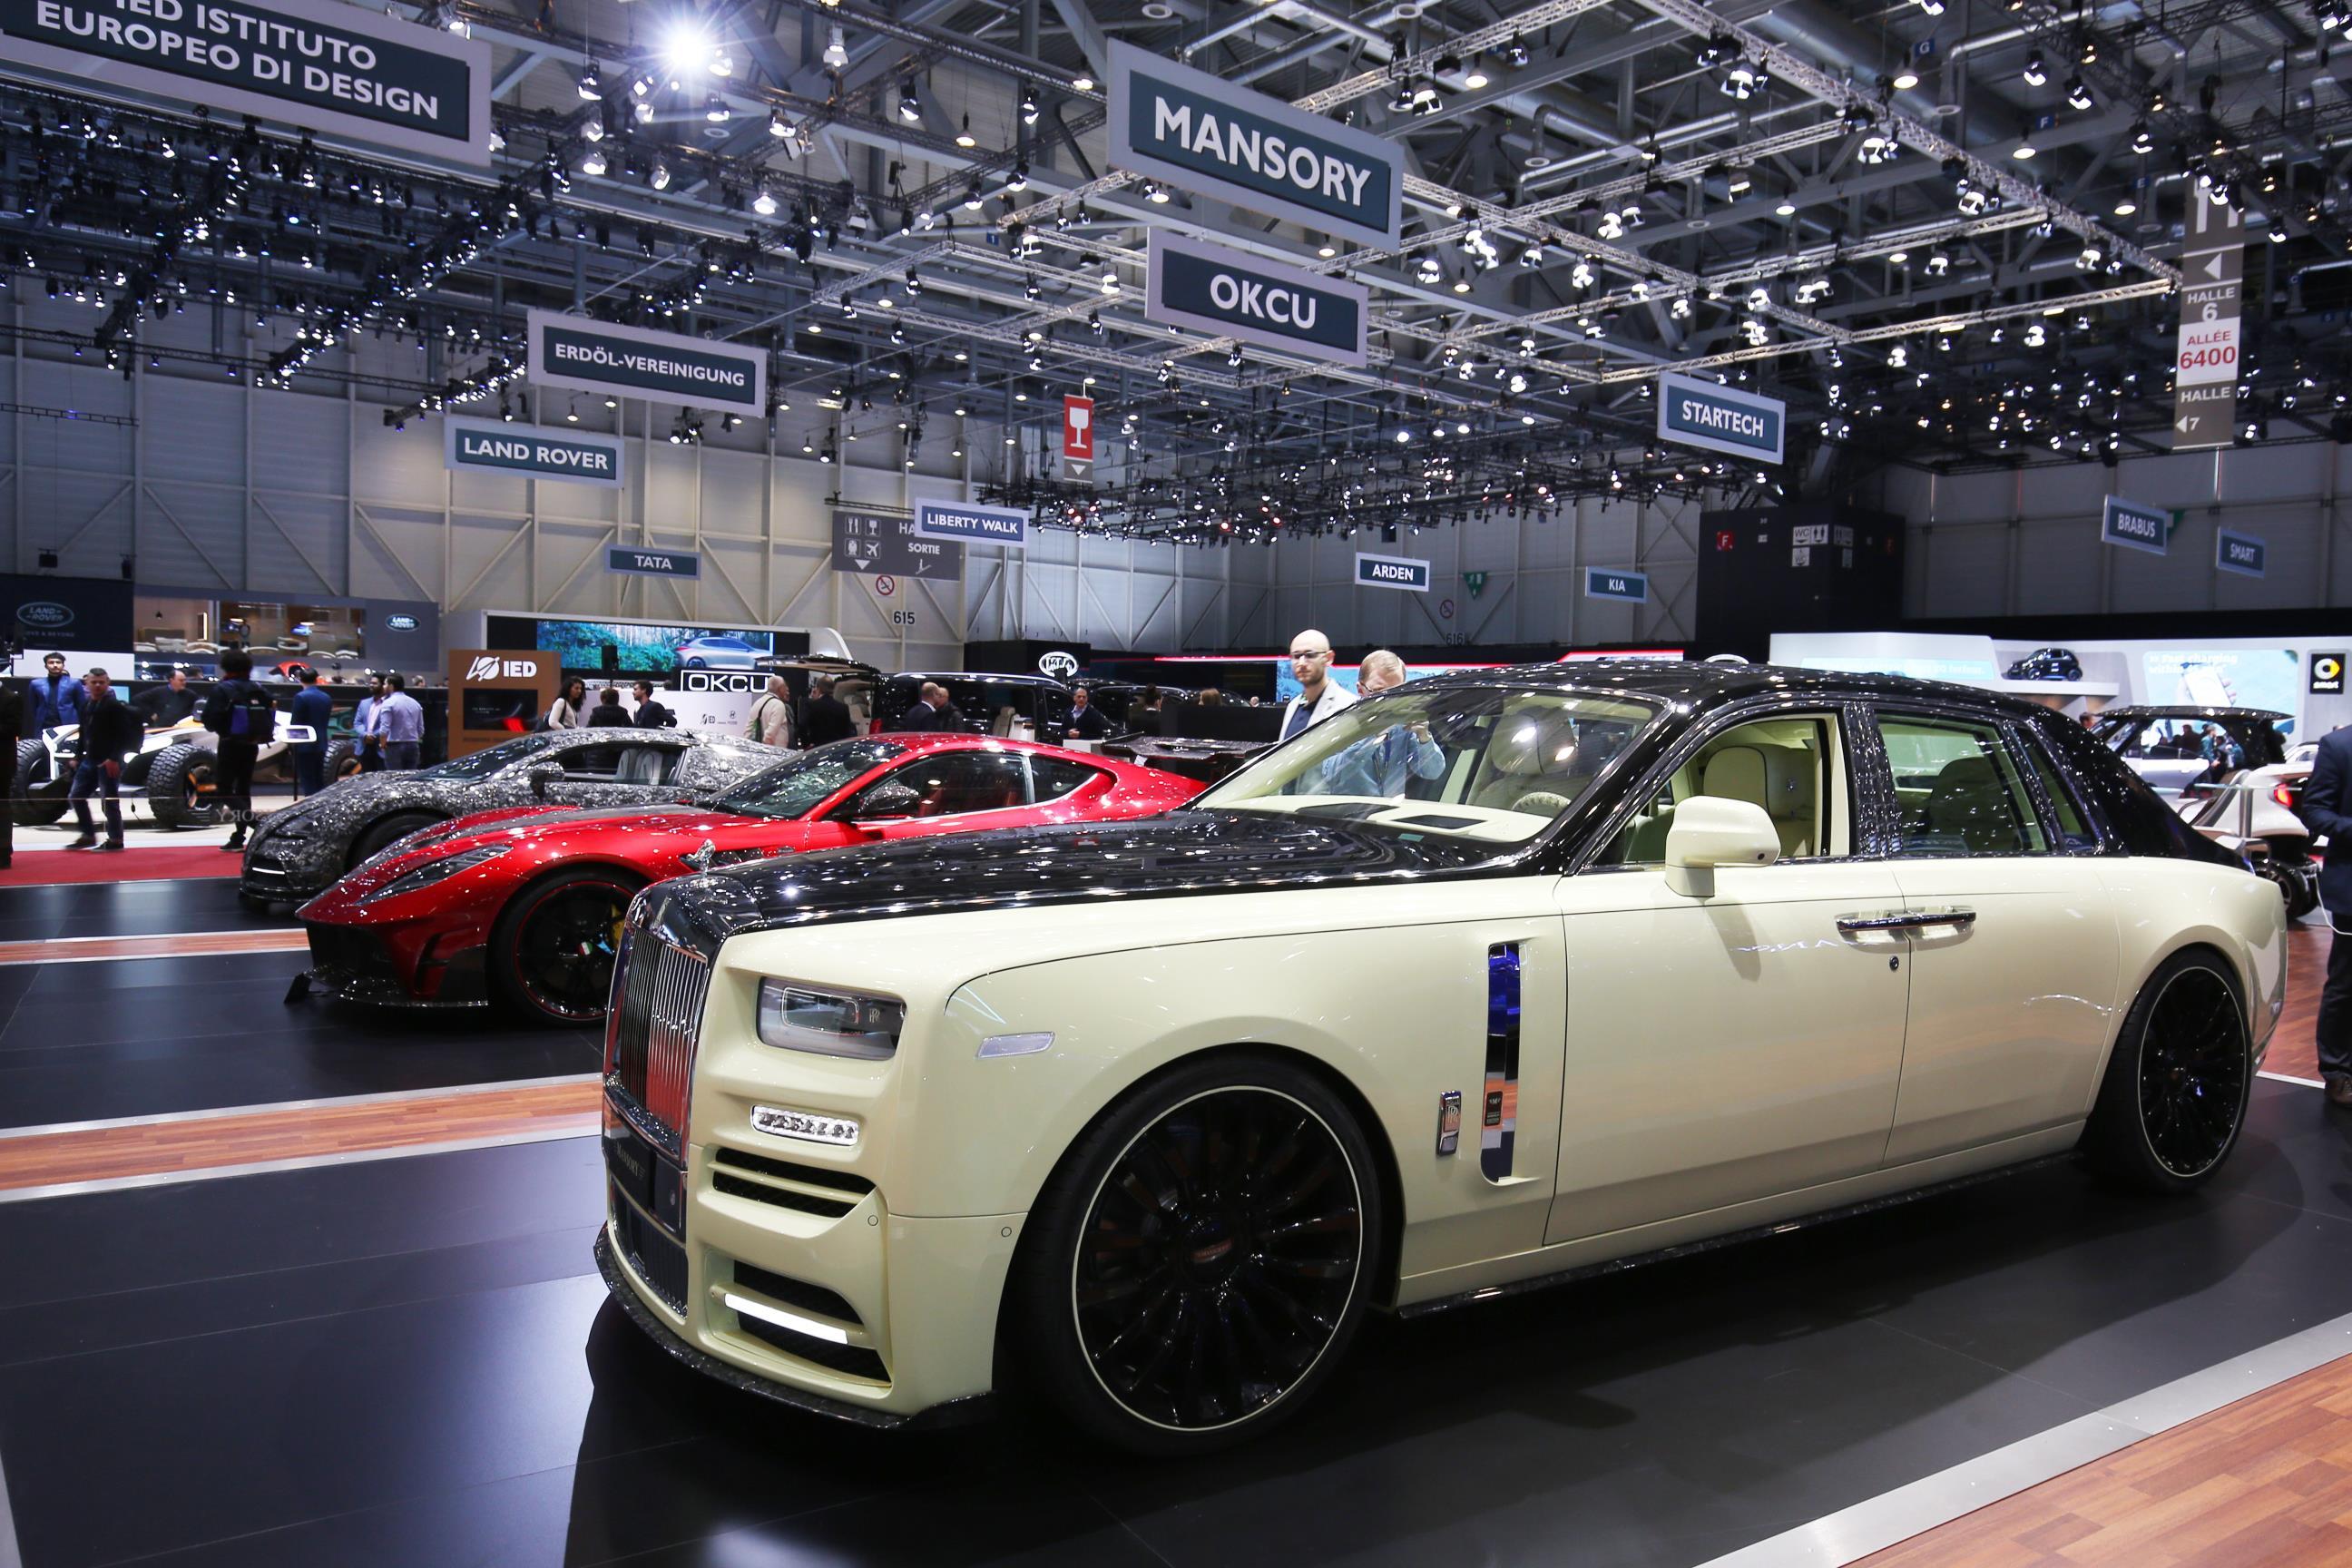 Geneva Motor Show 2018 Mega Gallery Part 2 (282)